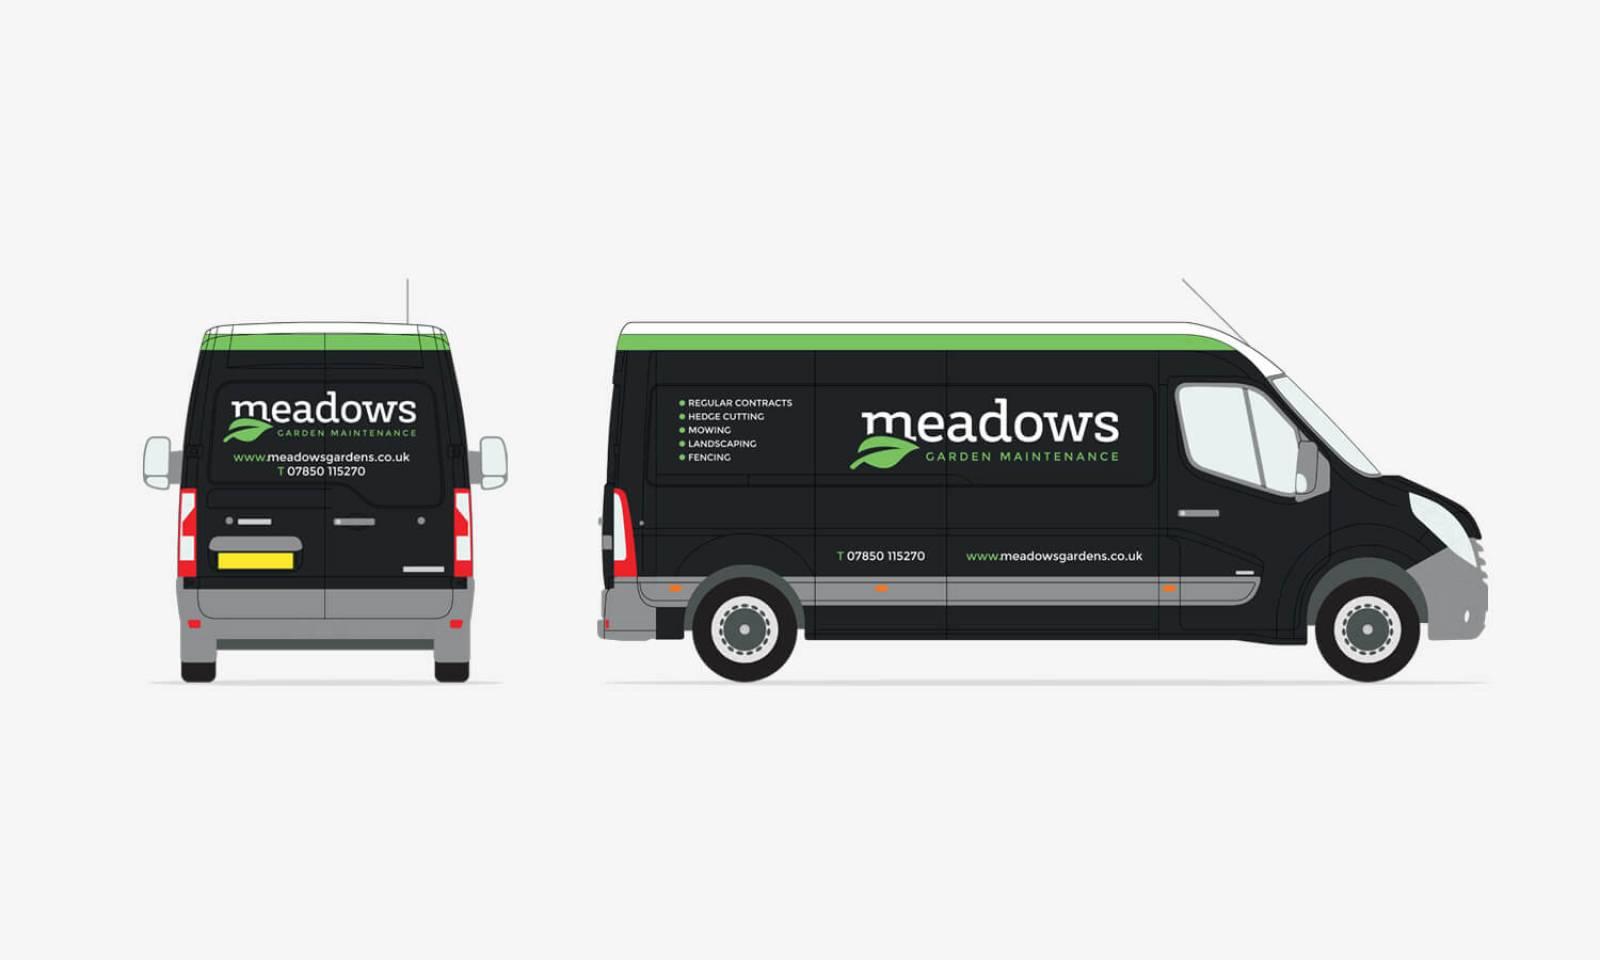 Meadows-van-corporate-identity-agency-graphic-design-canterbury.jpg